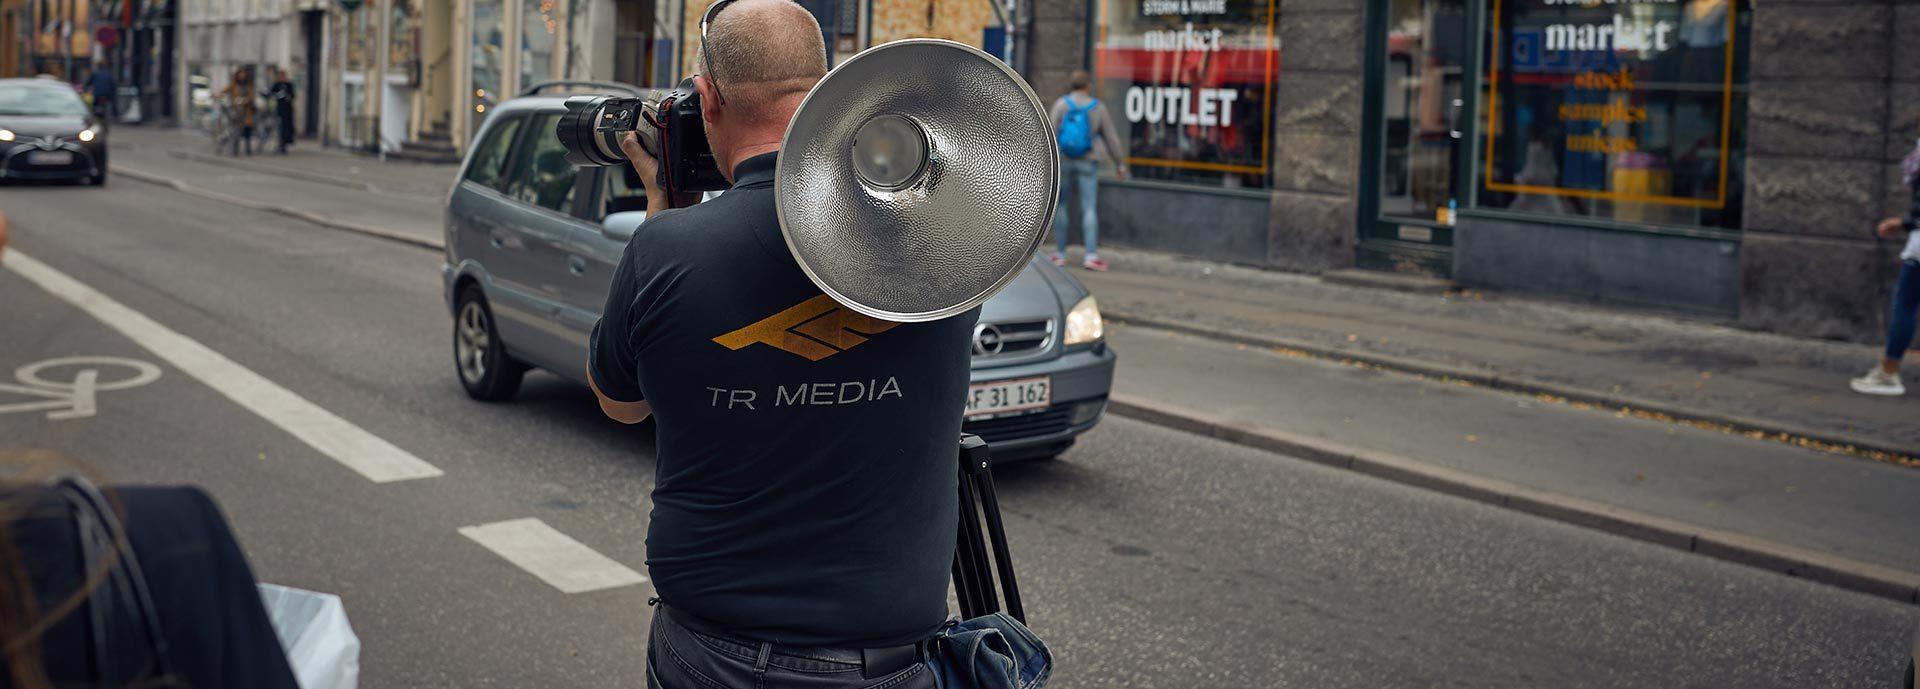 TR-Media ApS